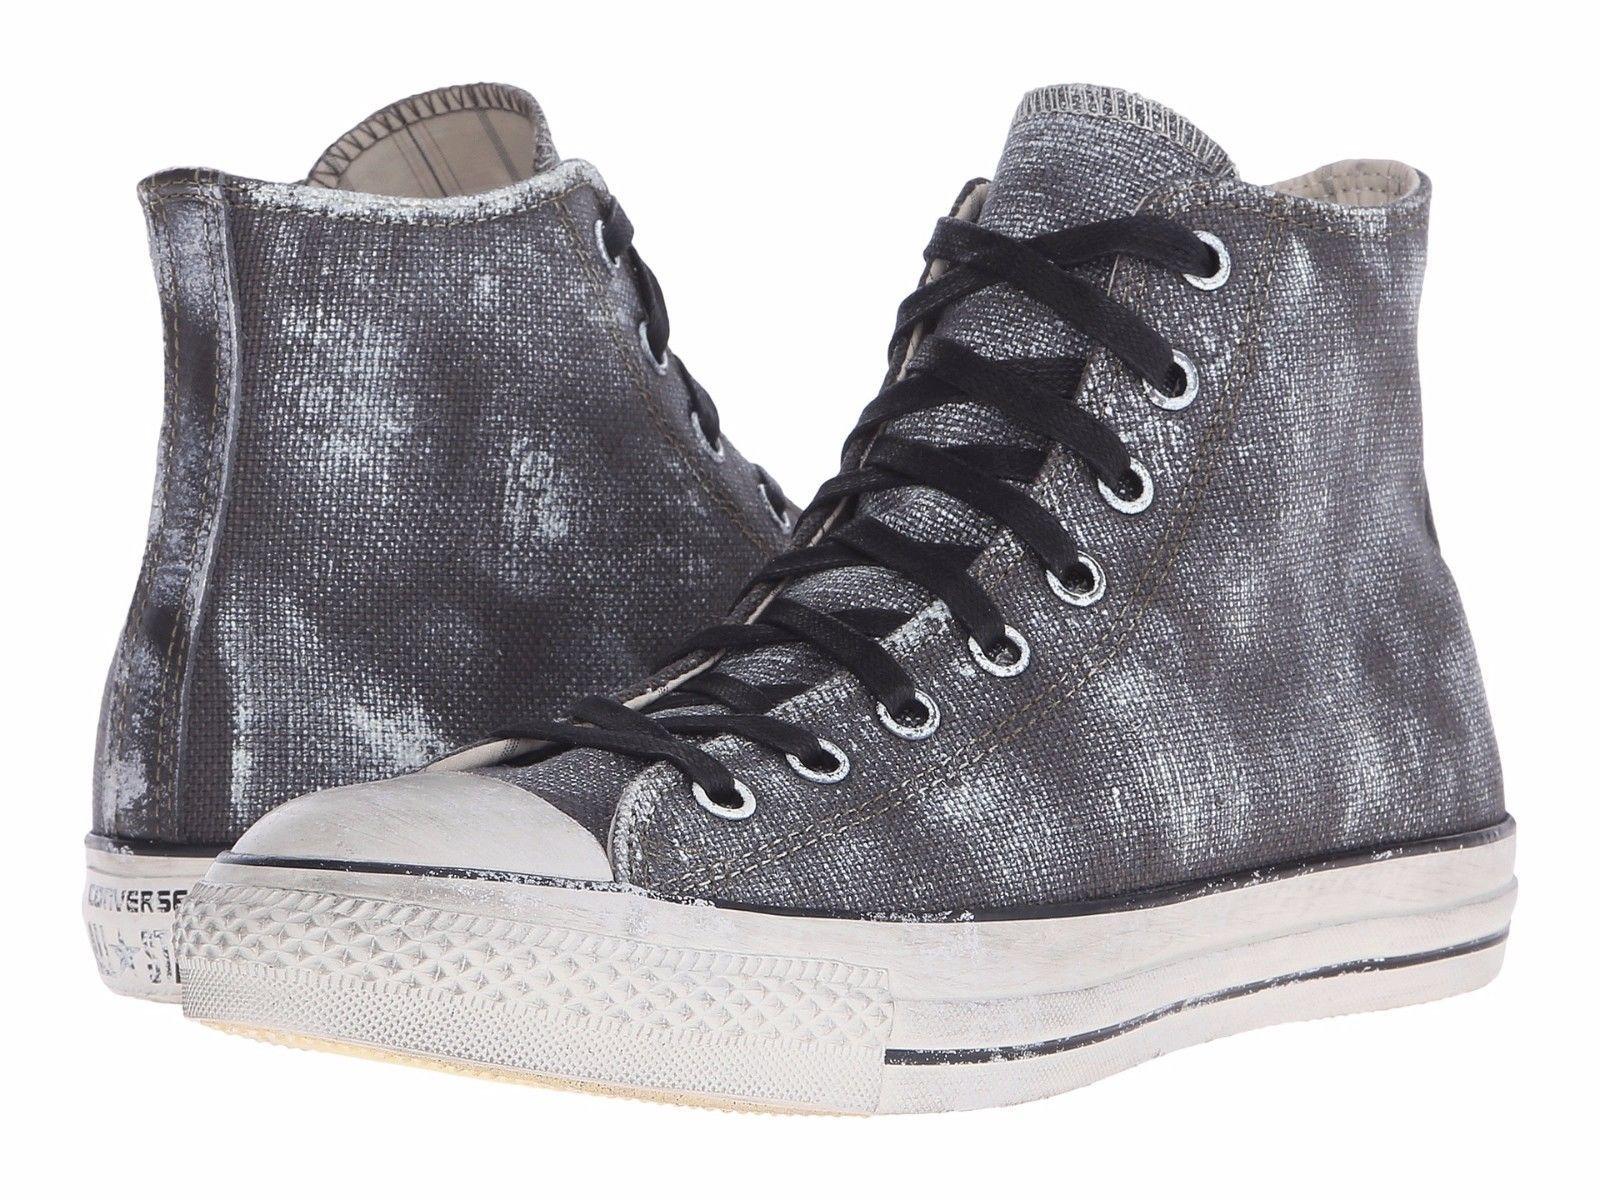 18d0b4bb98fee8 S l1600. S l1600. Previous. JOHN VARVATOS CONVERSE CHUCK TAYLOR ALL STAR  LIMITED Mens Sneaker Shoe!